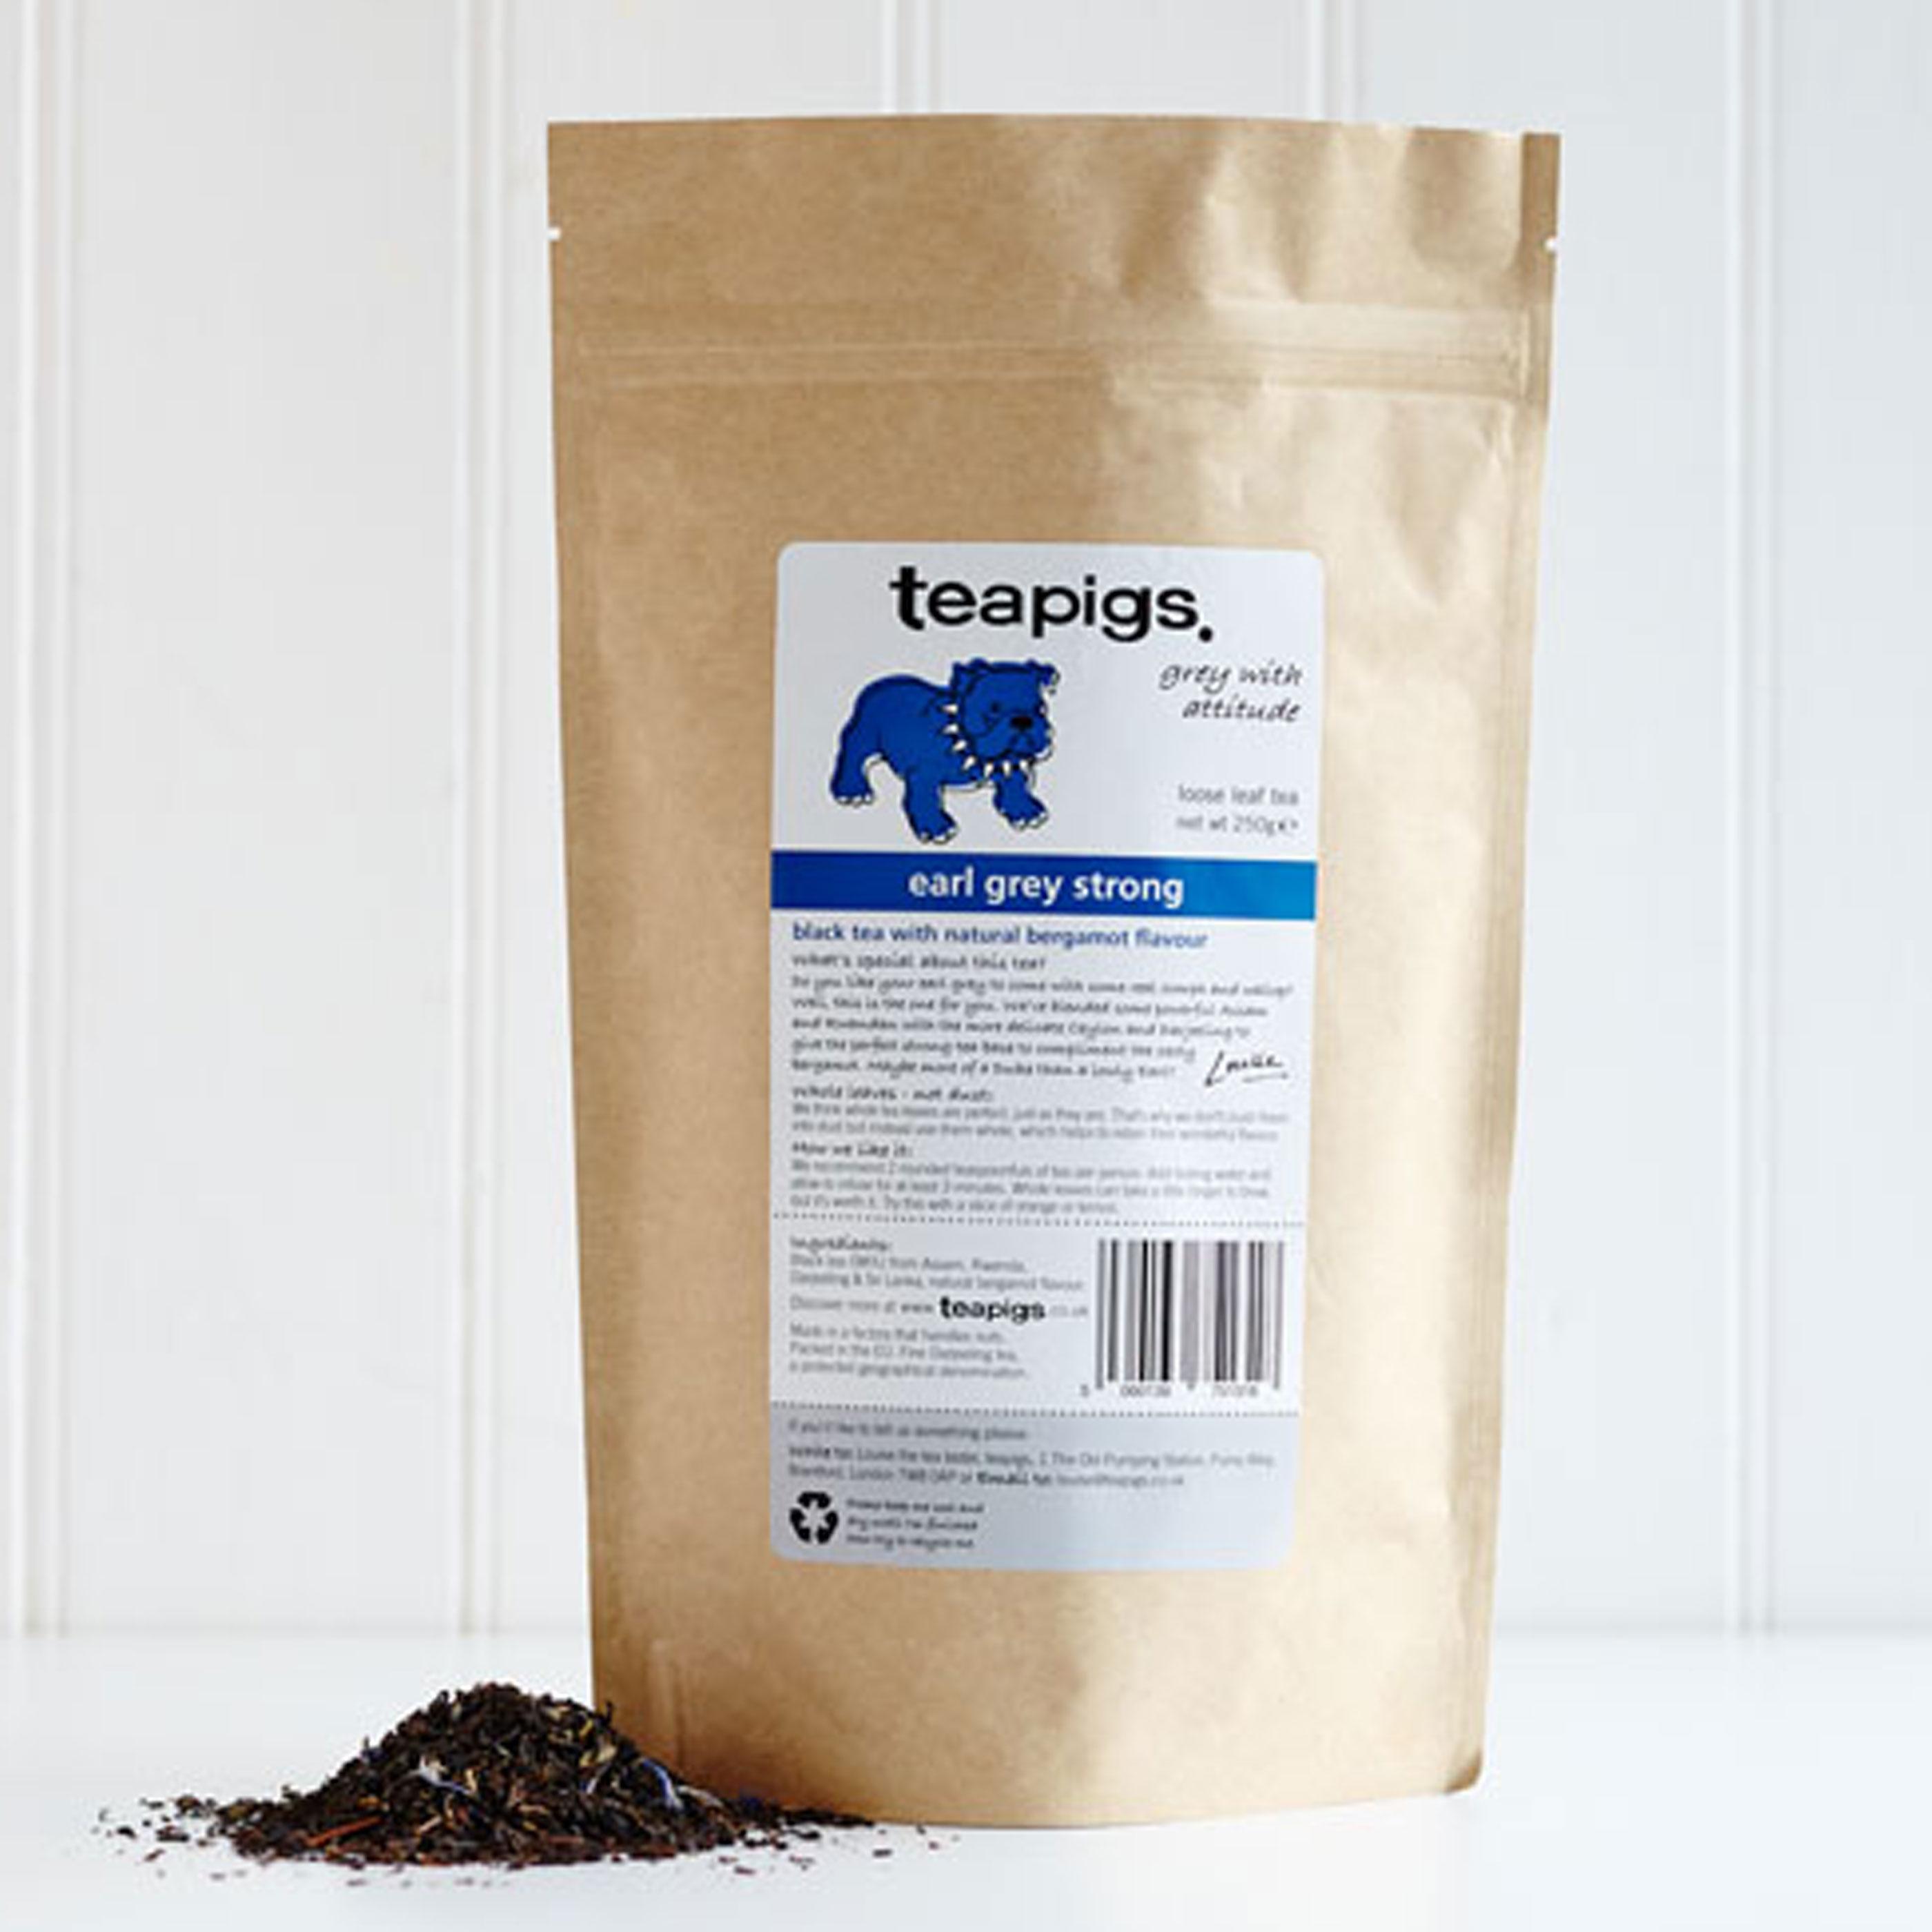 Ceai vrac, Teapigs, Tea, Ceai, HoReCa, Ceaiuri